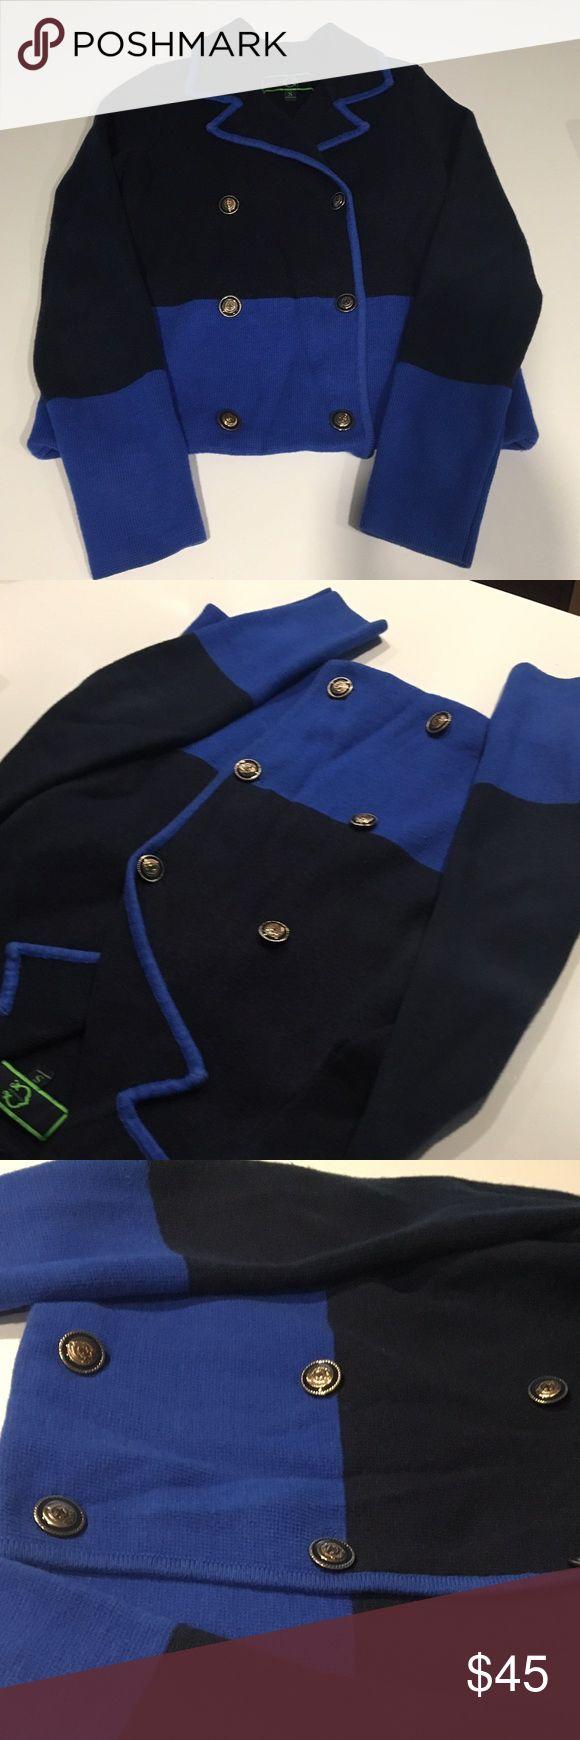 C Wonder // Colorblock cotton blazer Navy and cobalt cotton blazer with gold buttons Jackets & Coats Blazers